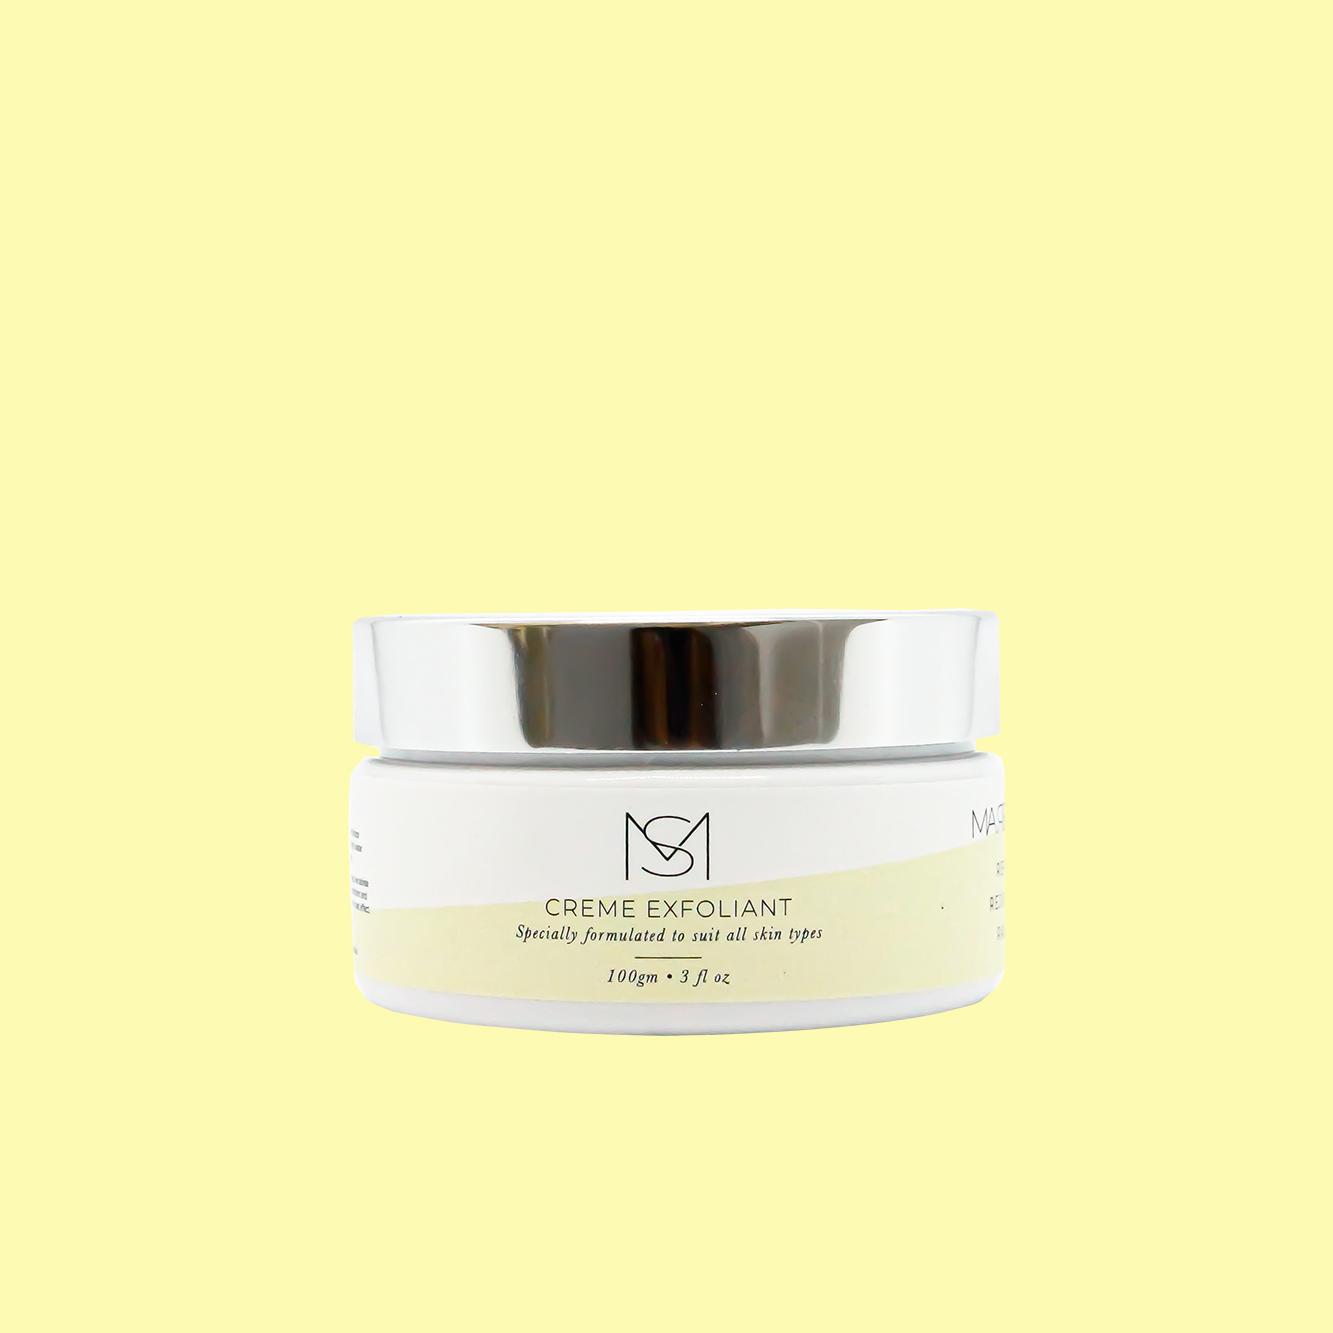 Creme Exfoliant 90g - Australian made skincare by Mariella Skin Perth WA 01